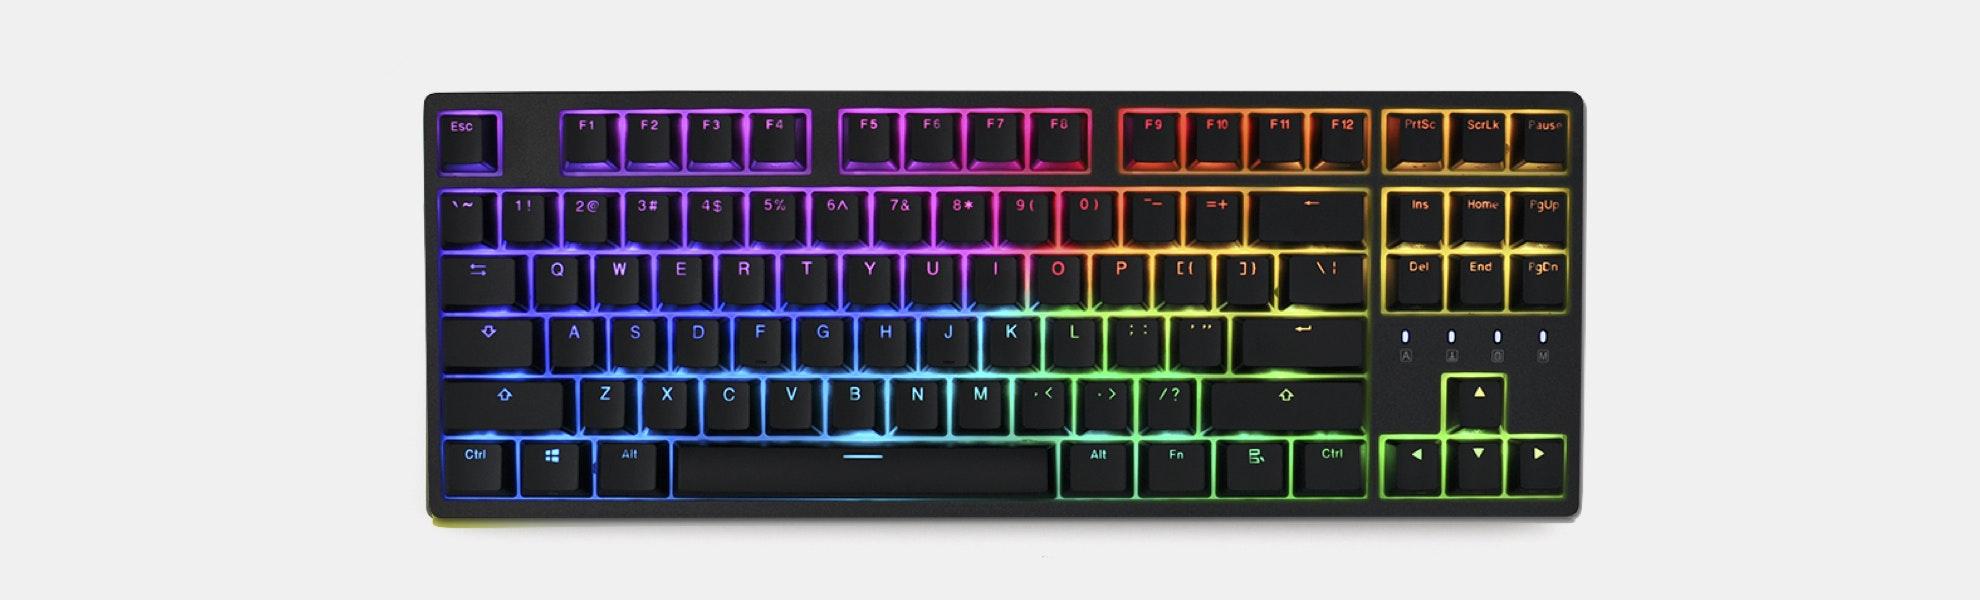 Durgod Taurus 320 Nebula RGB Mechanical Keyboard